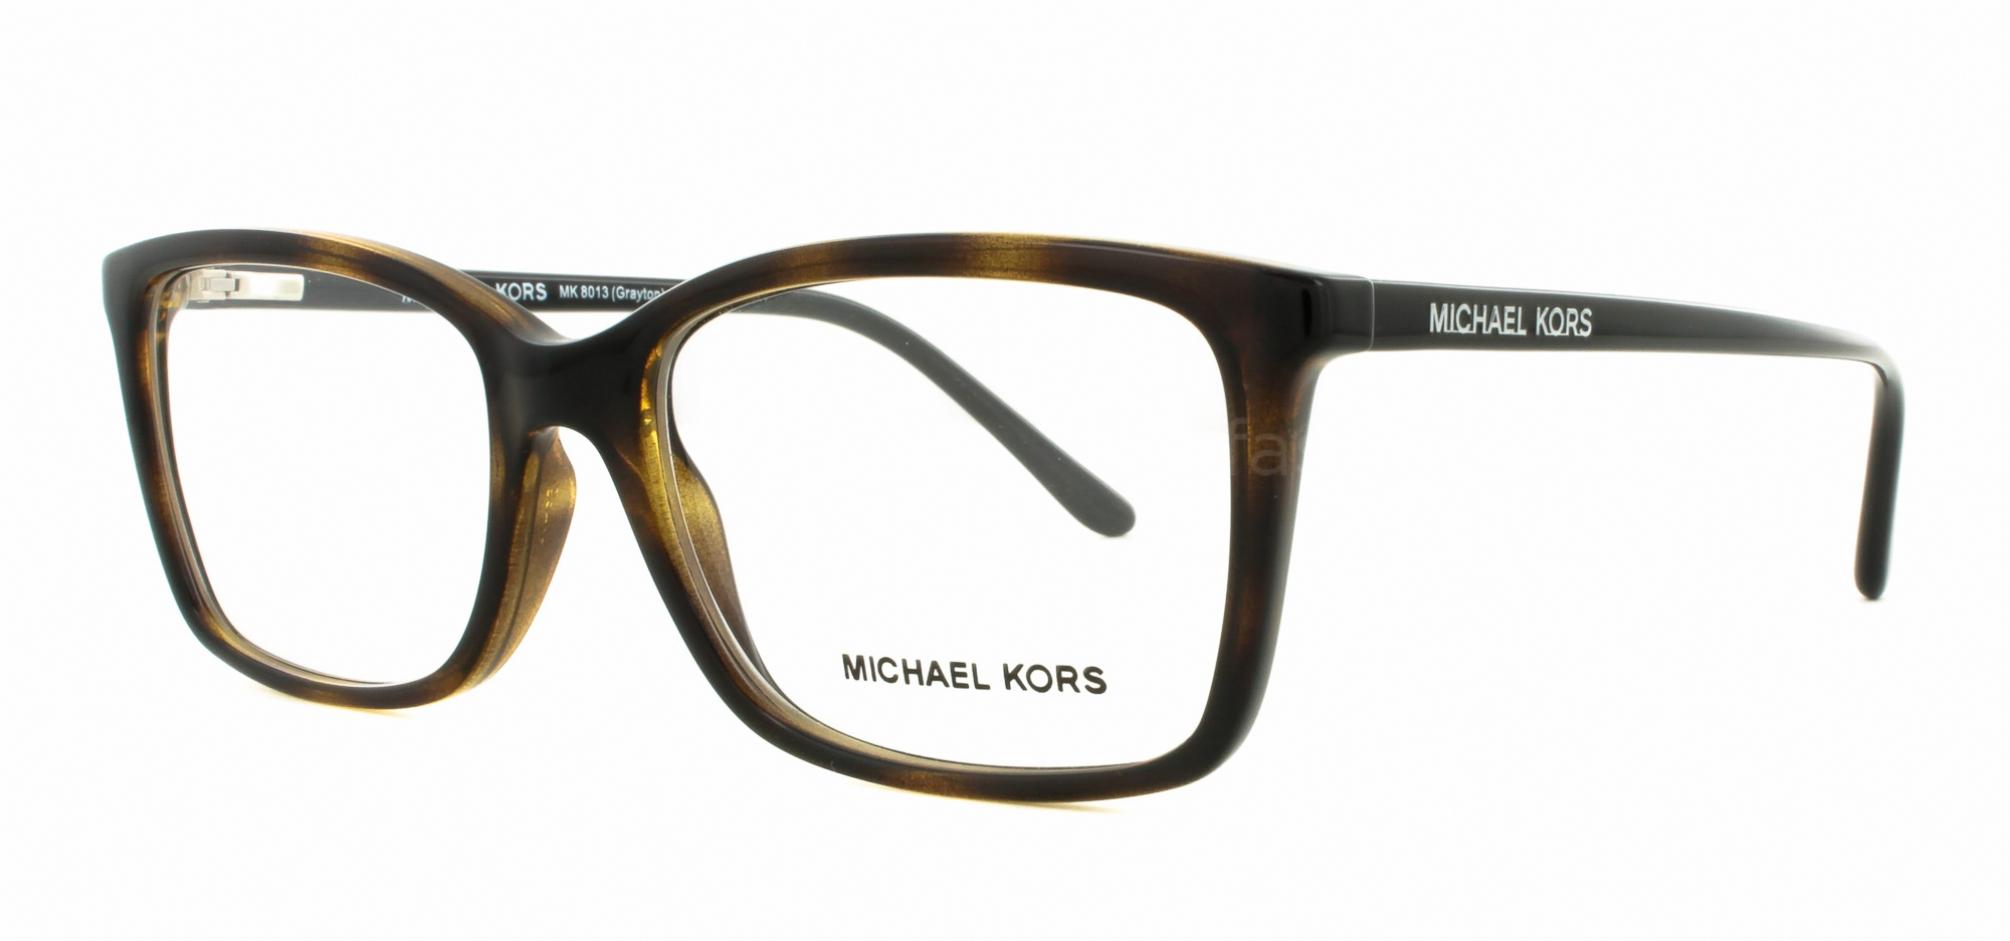 MICHAEL KORS GRAYTON 8013 3057